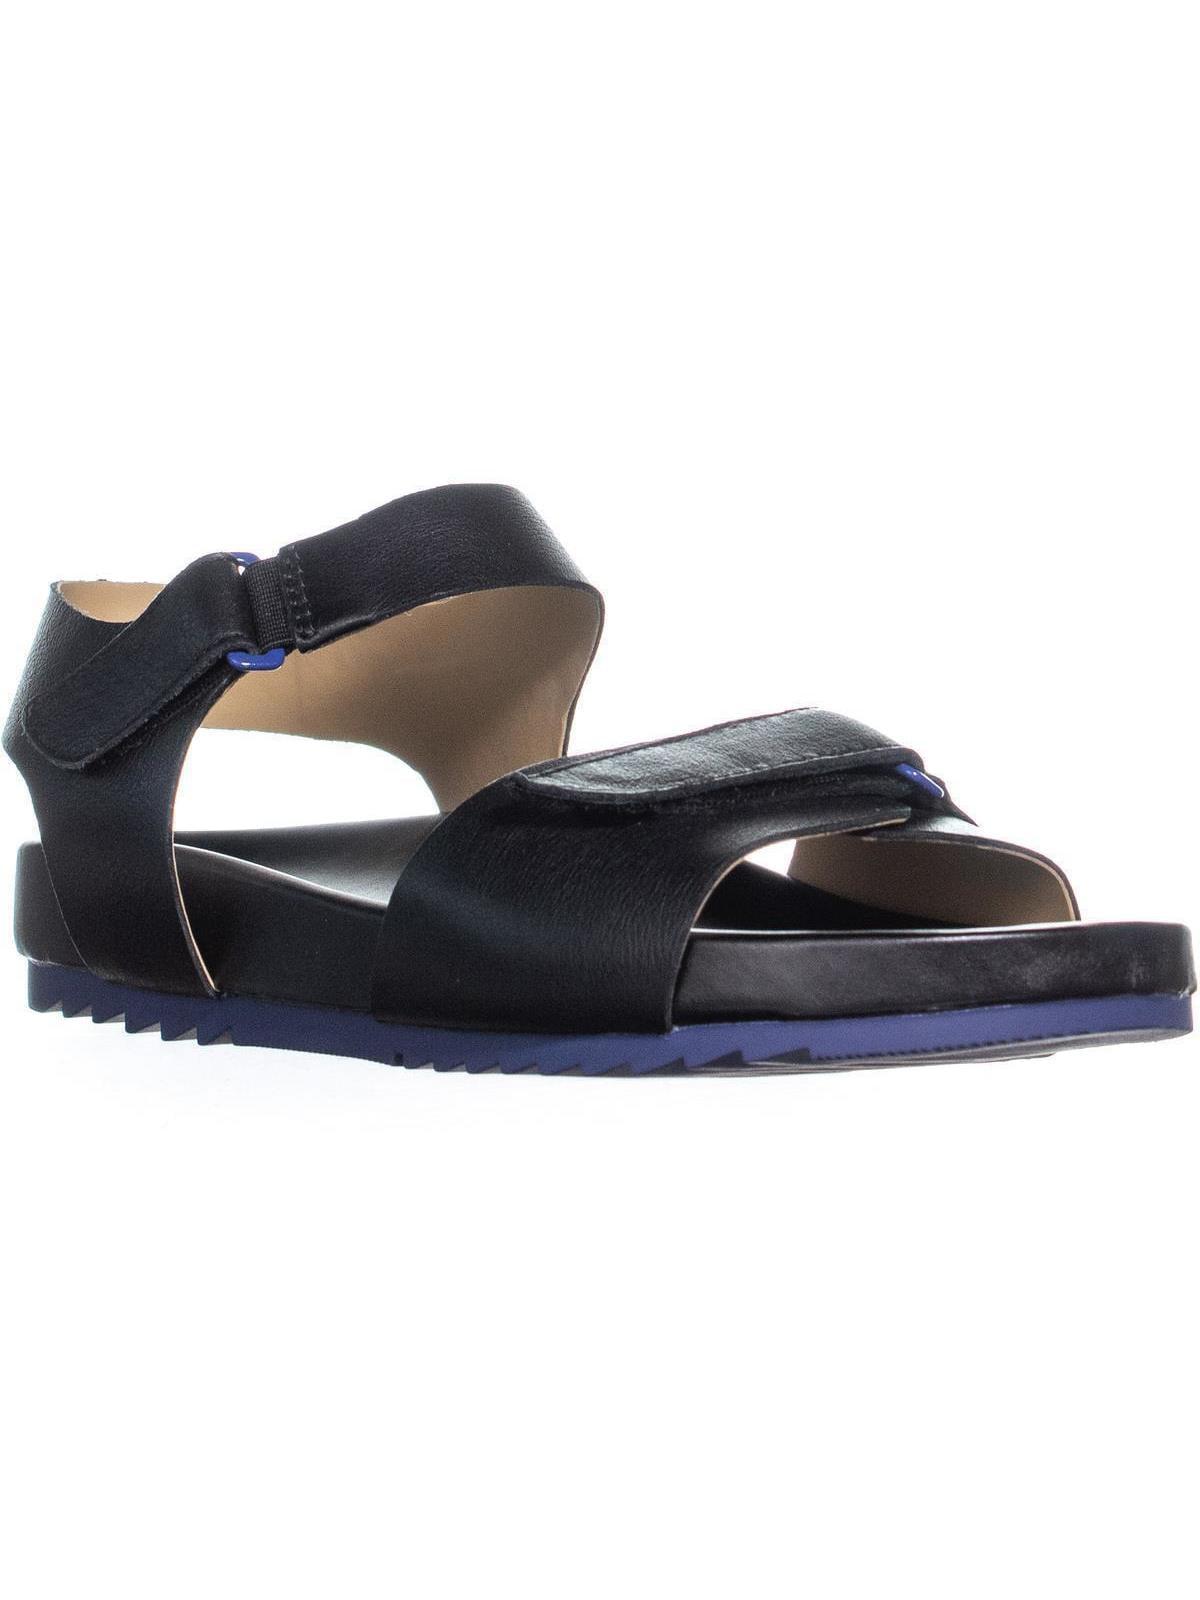 Womens Naturalizer Ari Strap Sport Sandals, Black, 9.5 W US by Naturalizer